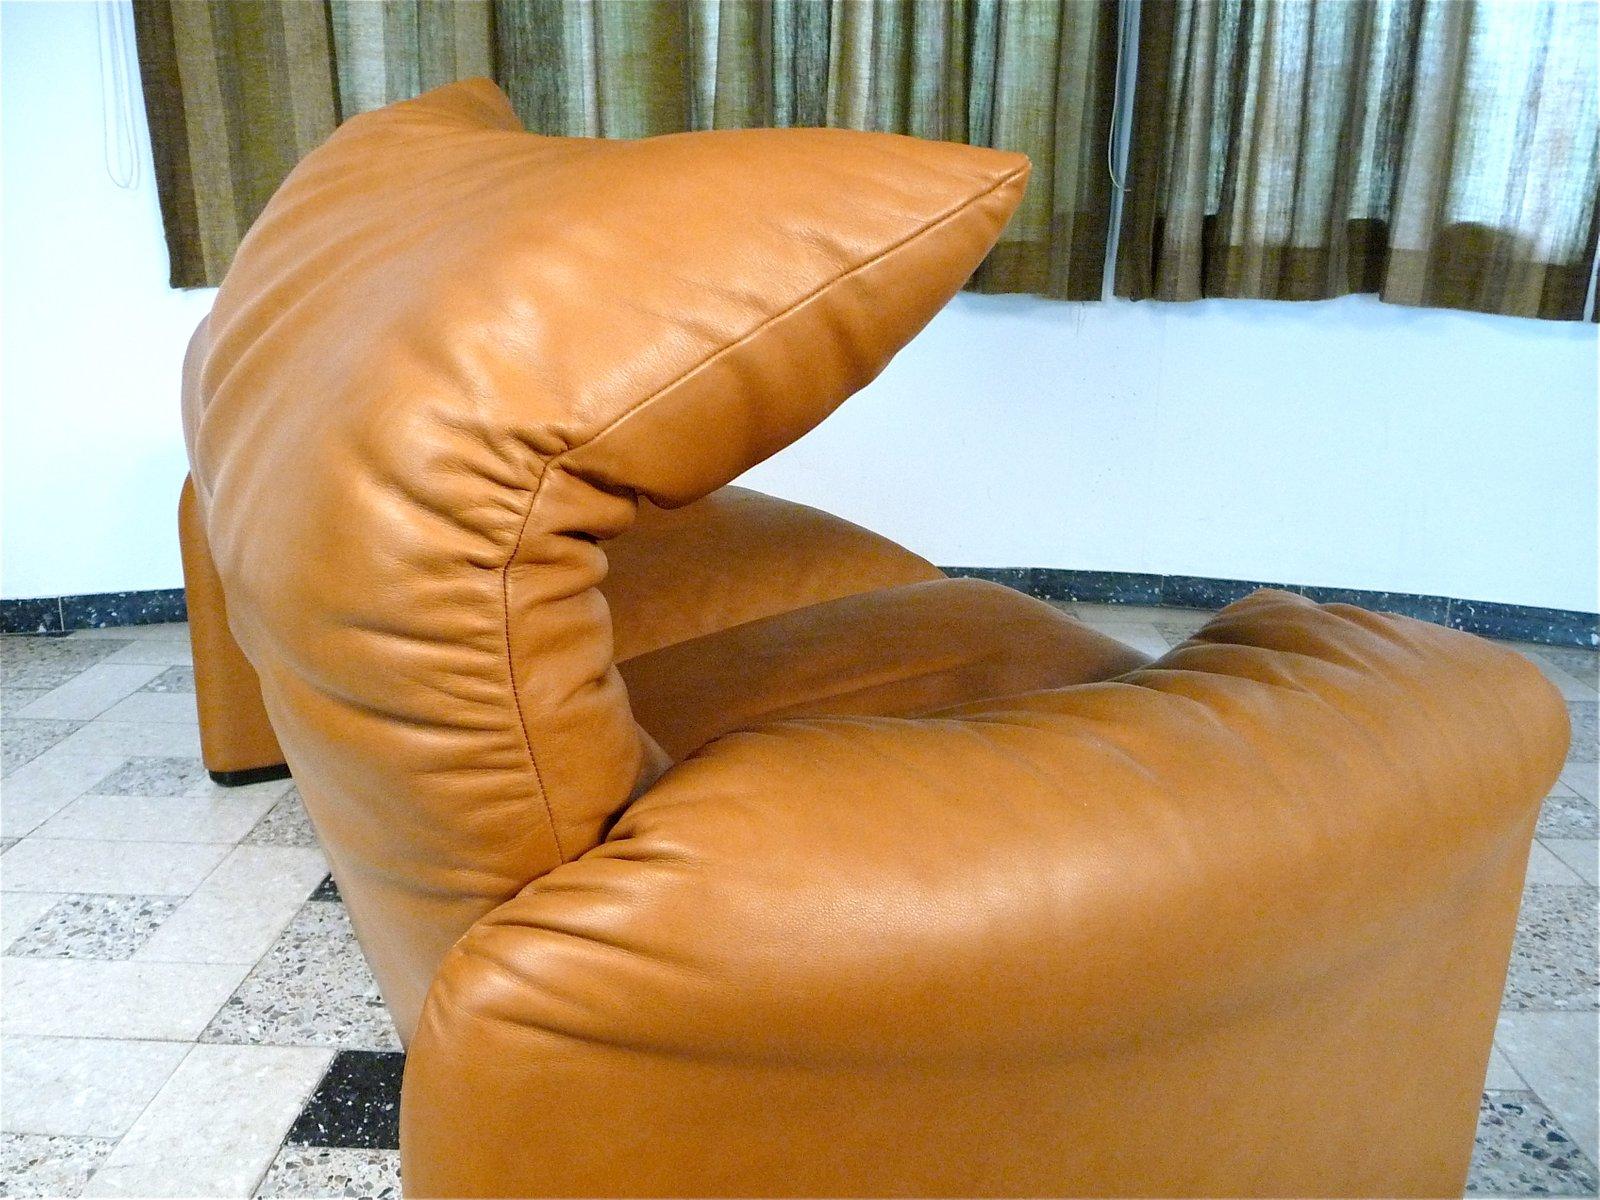 maralunga 2 sitzer ledersofa von vico magistretti f r. Black Bedroom Furniture Sets. Home Design Ideas